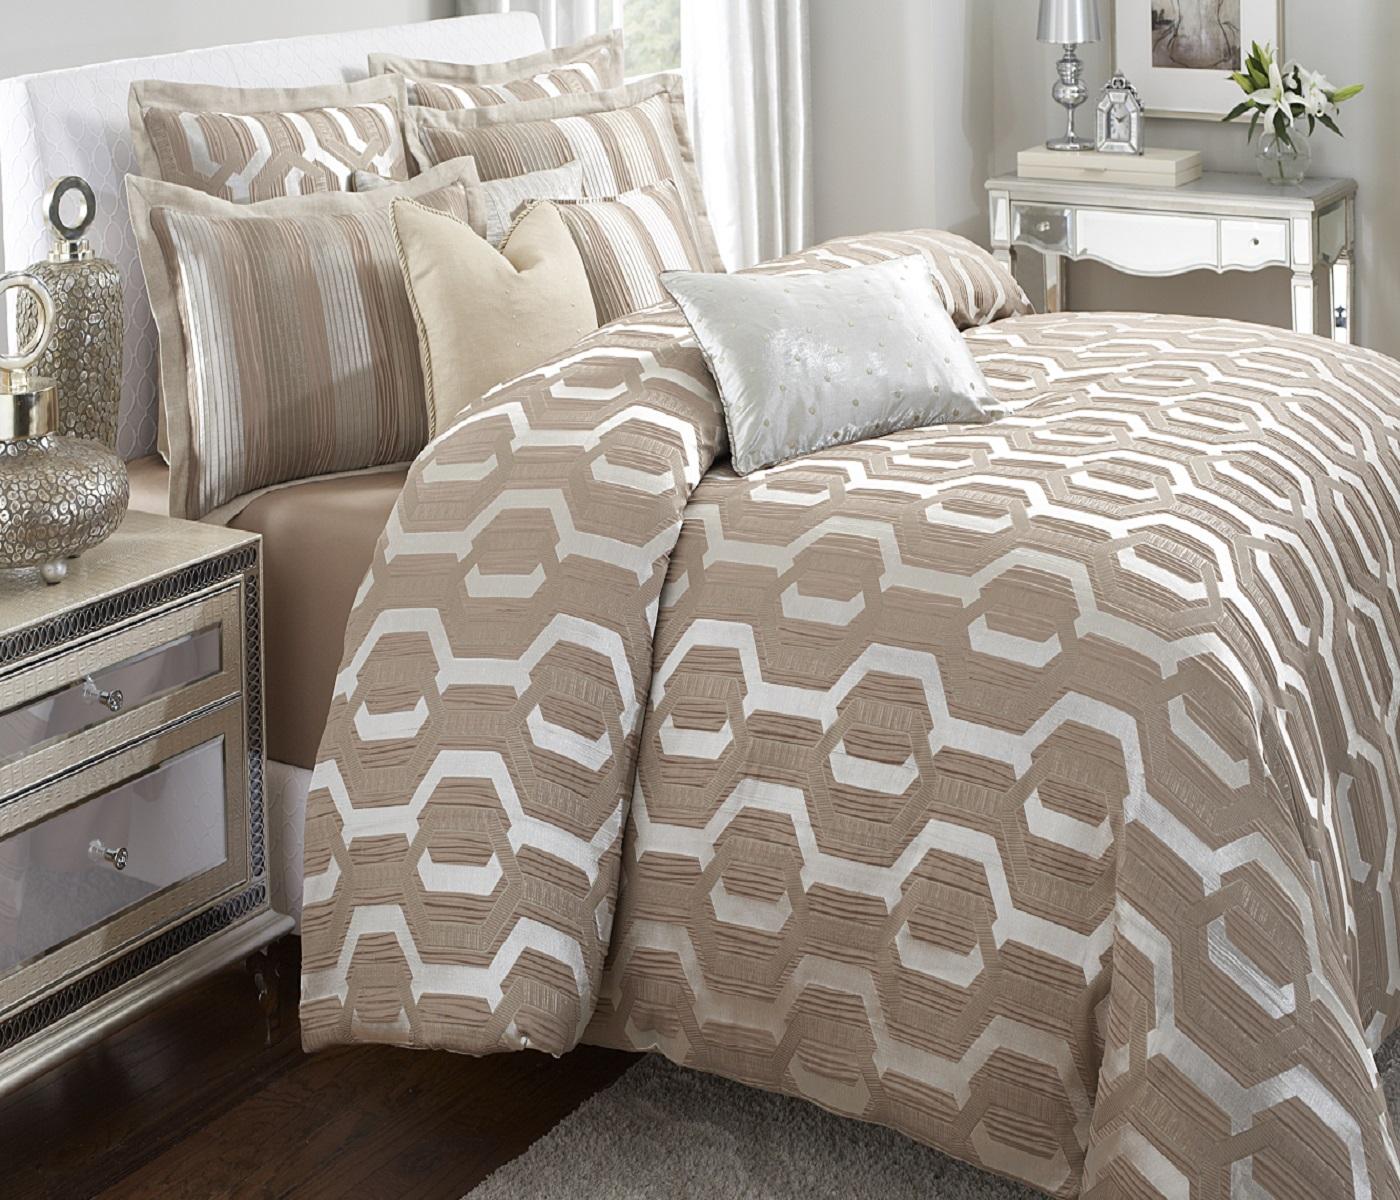 Contemporary Luxury Bedding Set Ideas